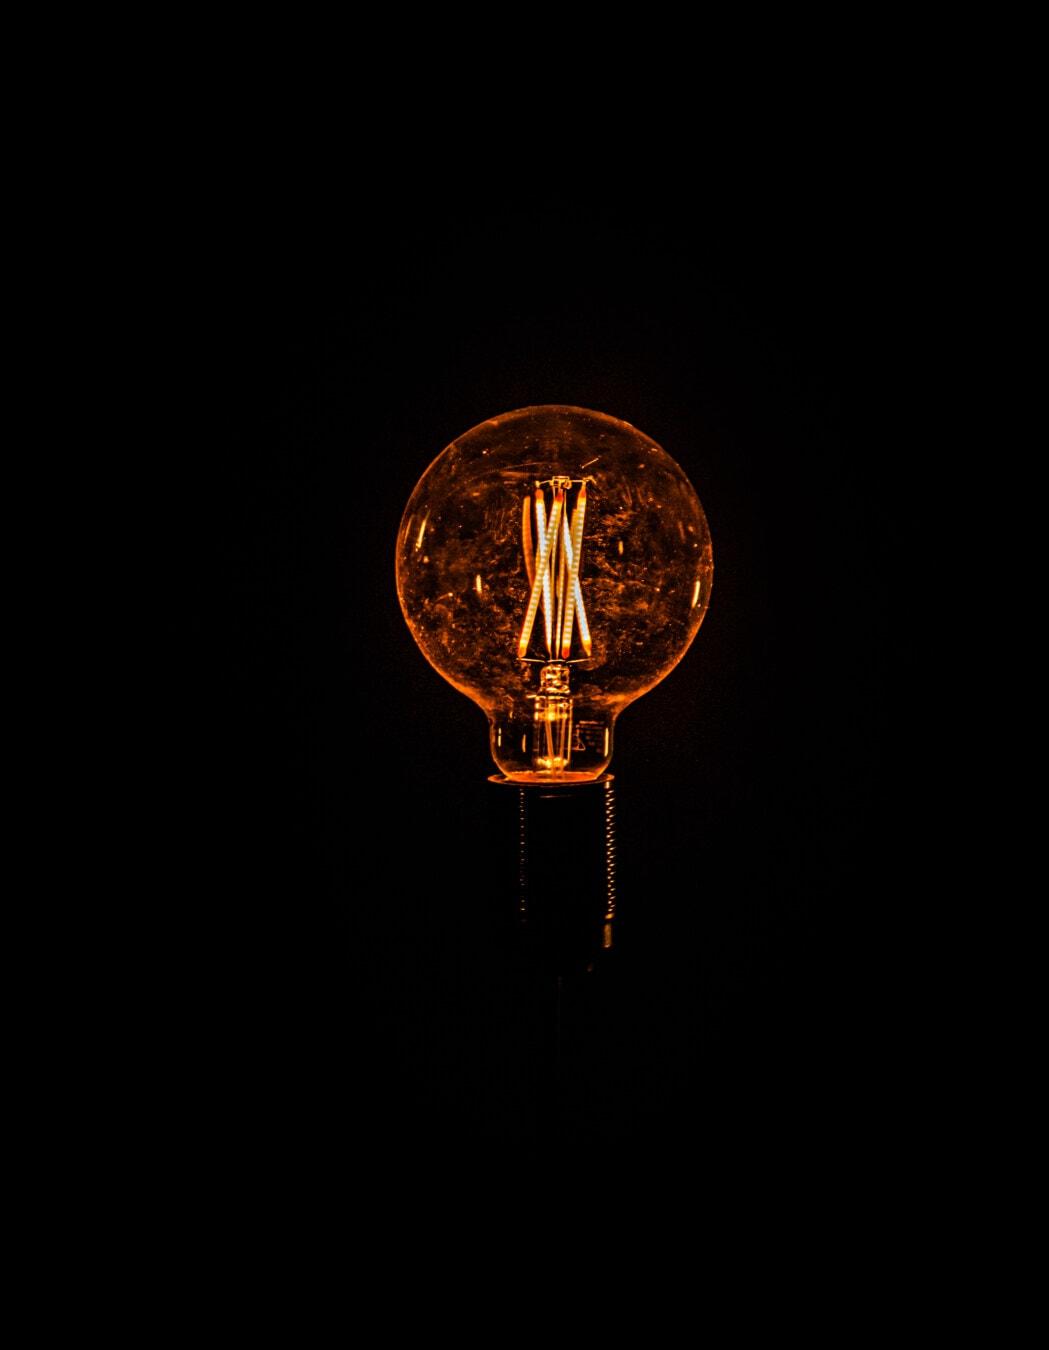 wireless, transmission, electricity, science, idea, light bulb, wire, bulb, illuminated, light